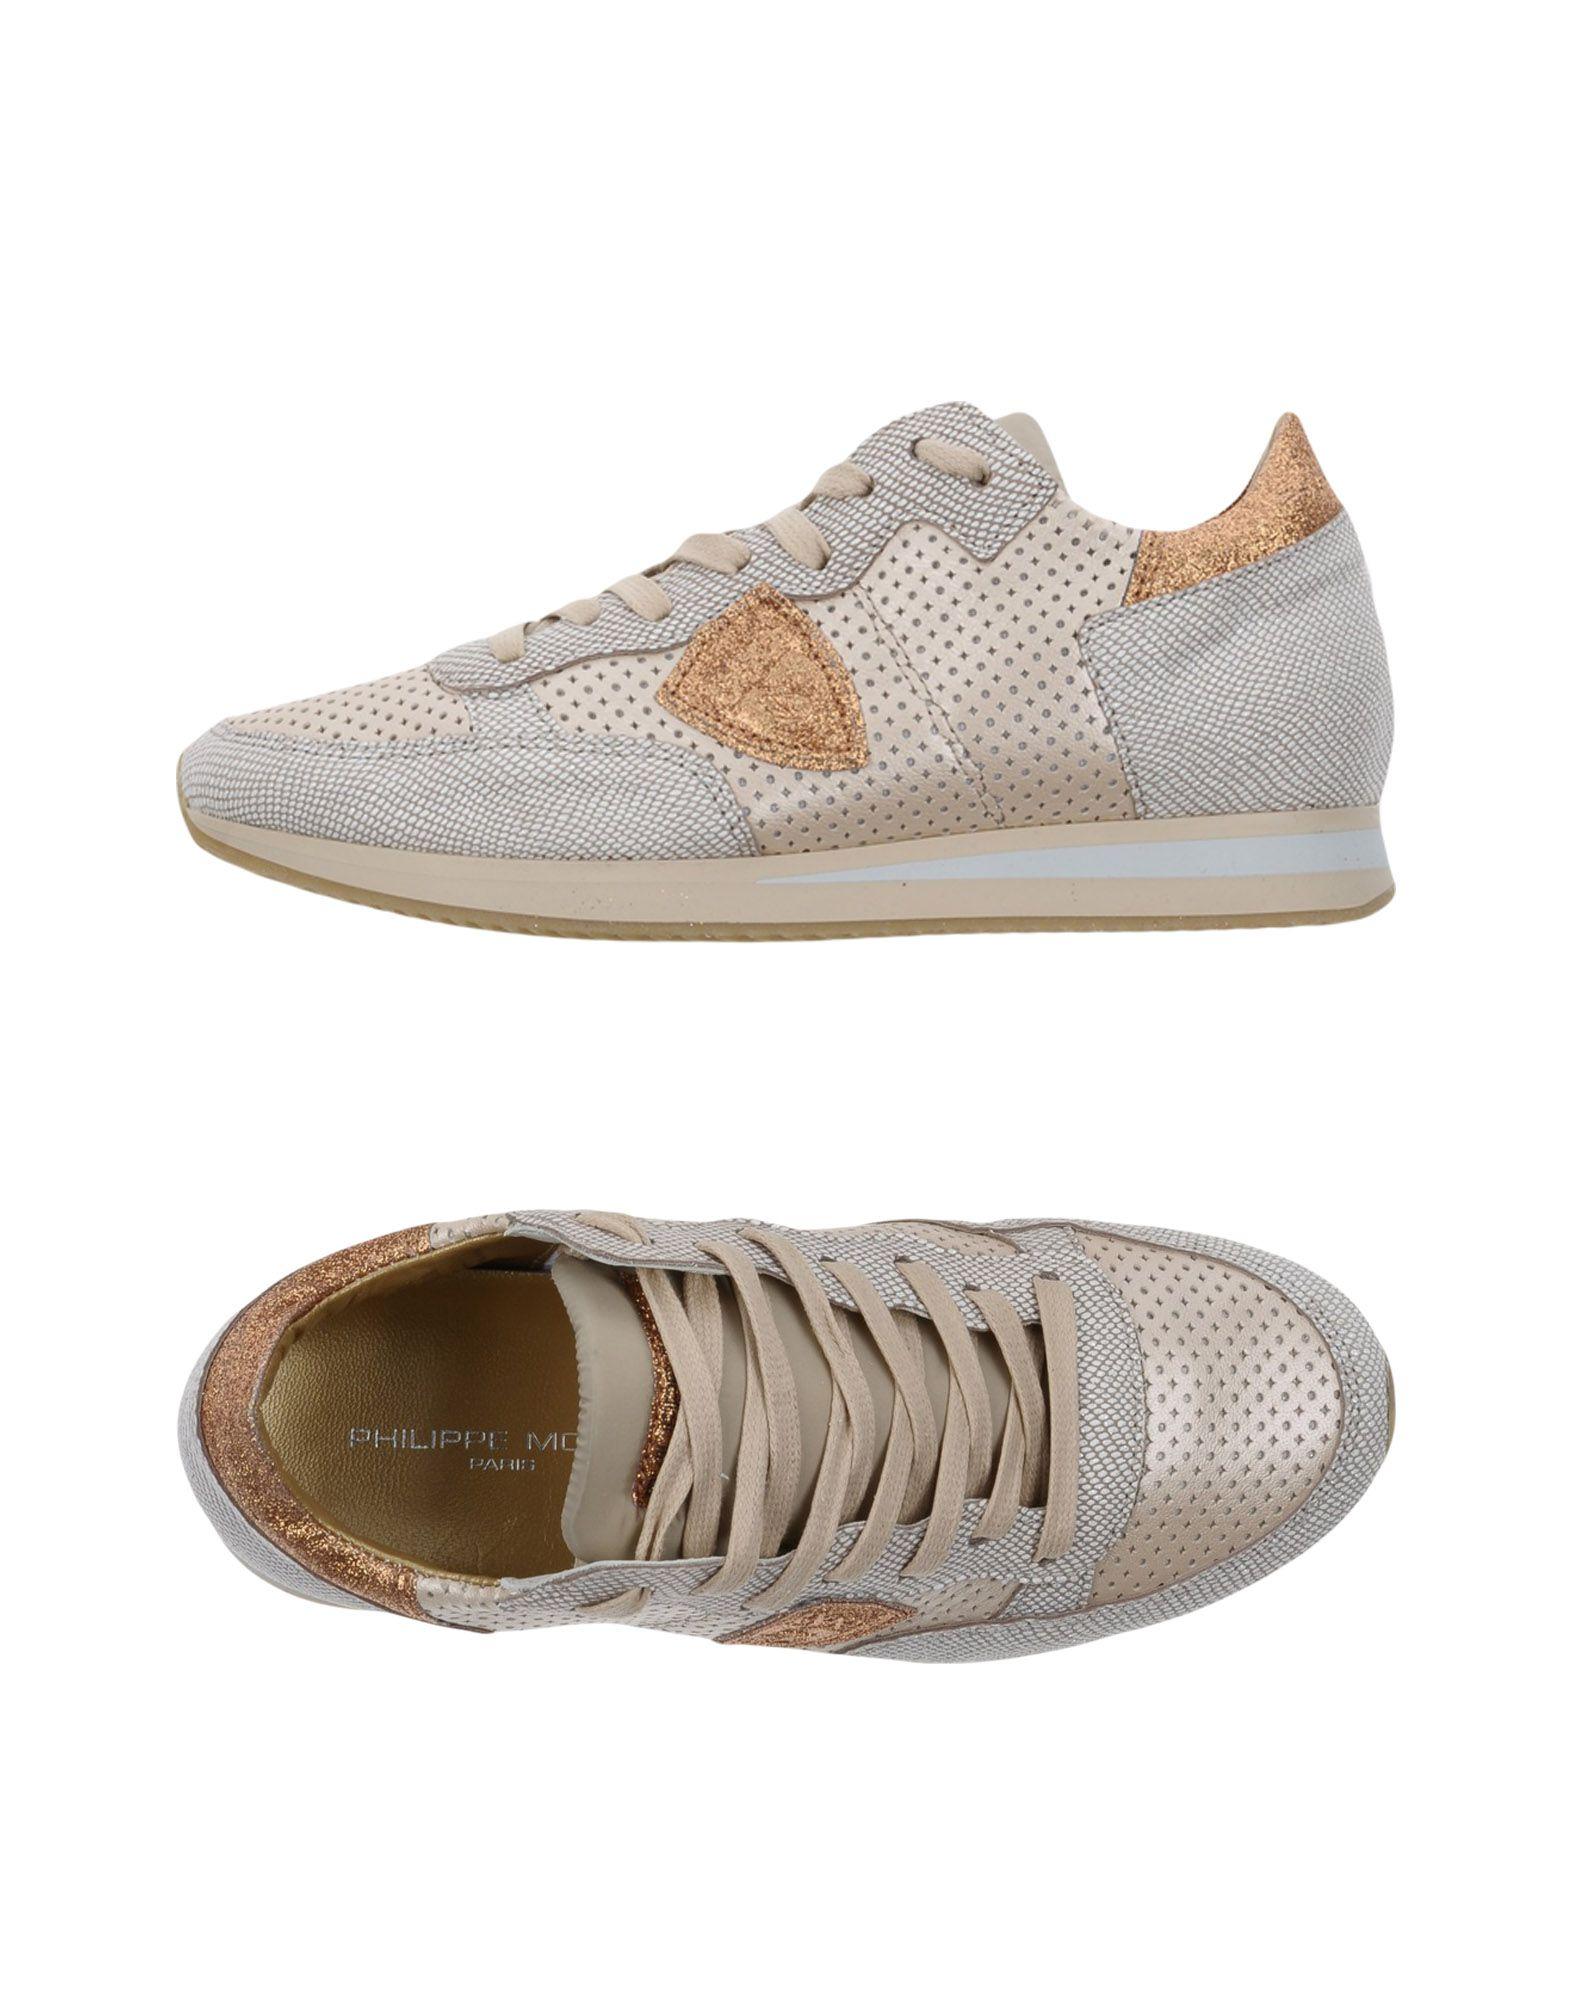 Philippe Model Sneakers Damen  11360732MIGut aussehende strapazierfähige Schuhe